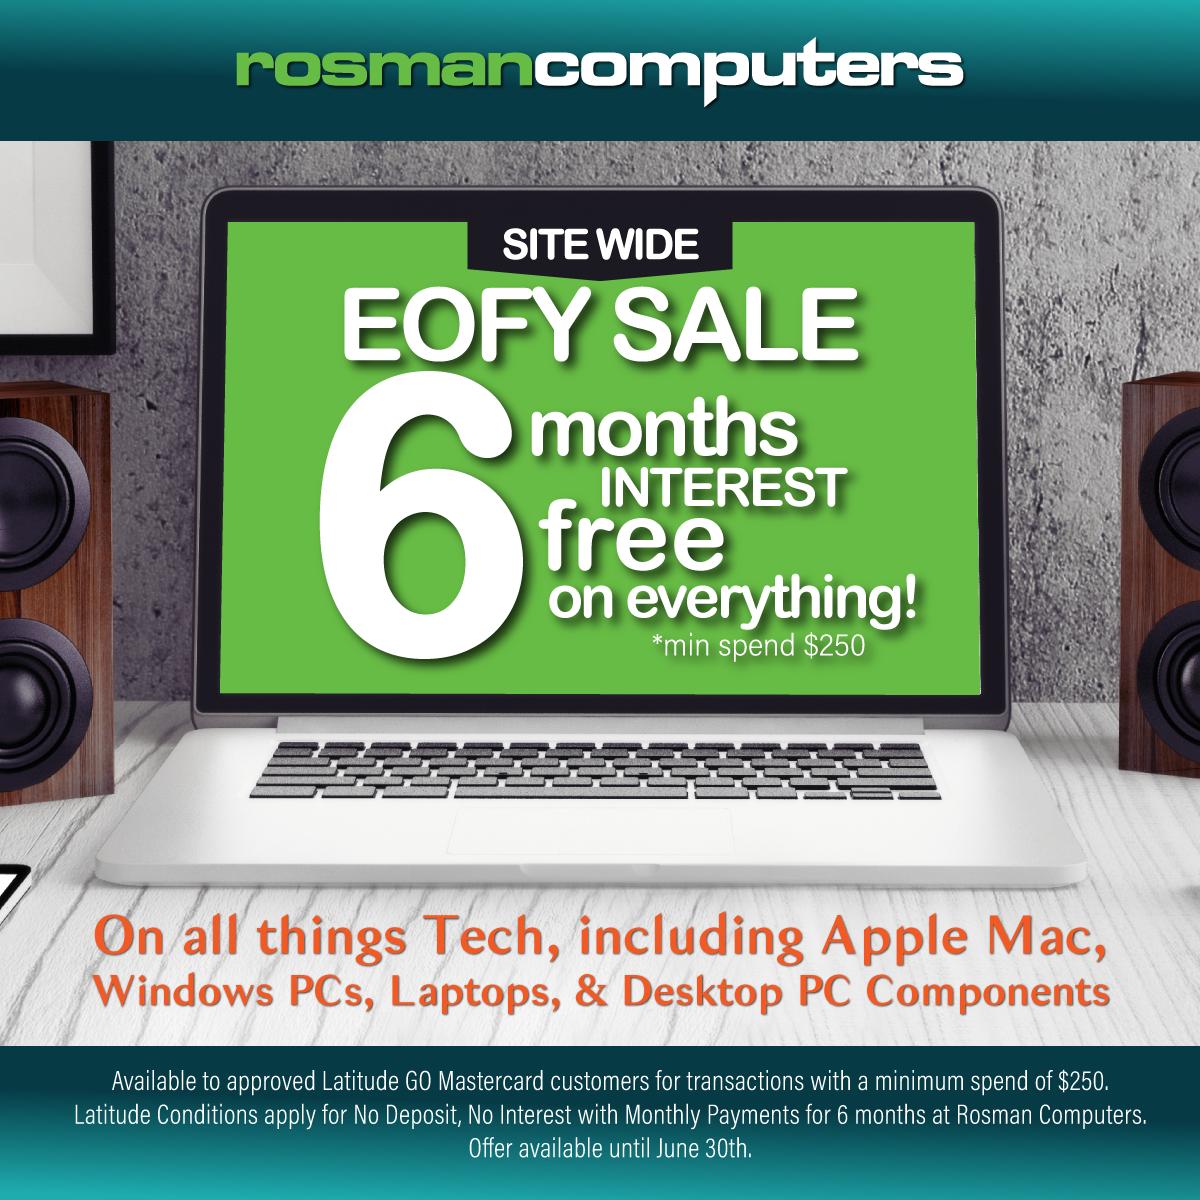 rosman-computers-600px-w-solus-edm.png